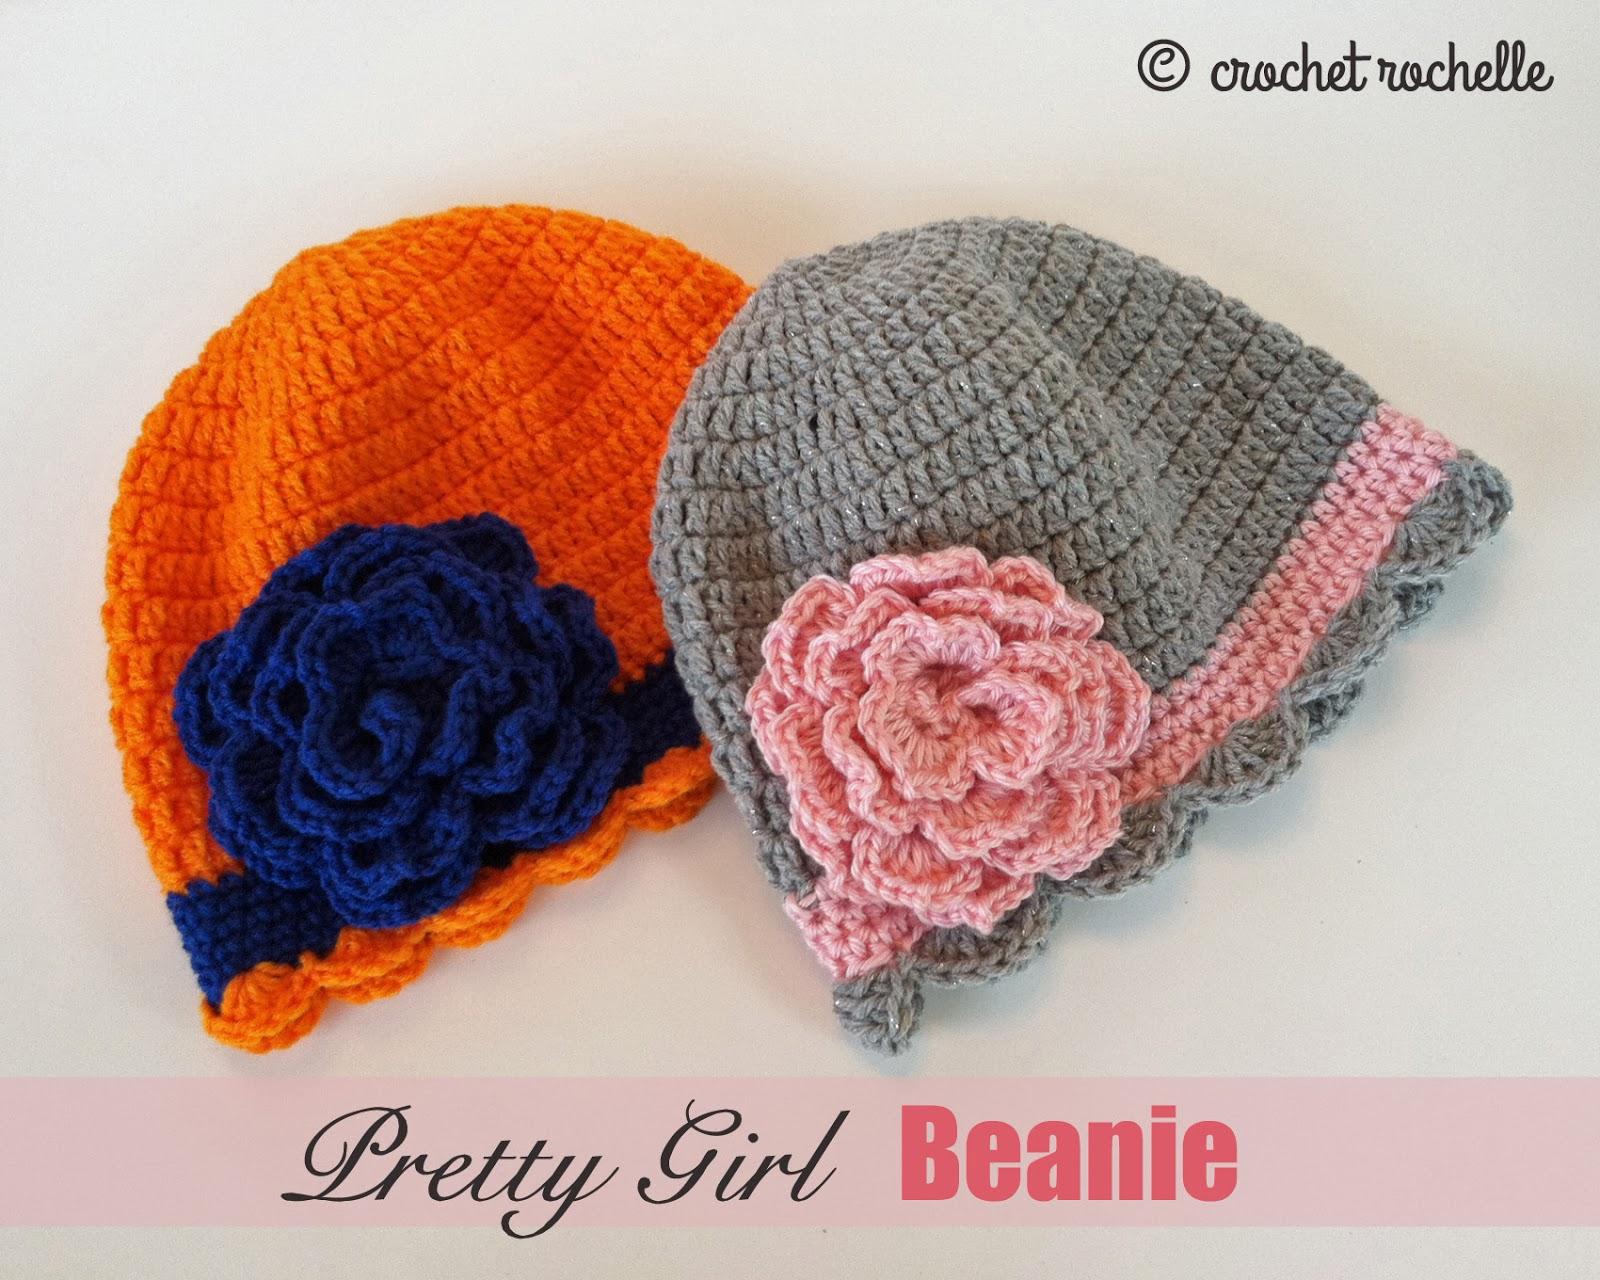 Crochet Rochelle Pretty Girl Beanie